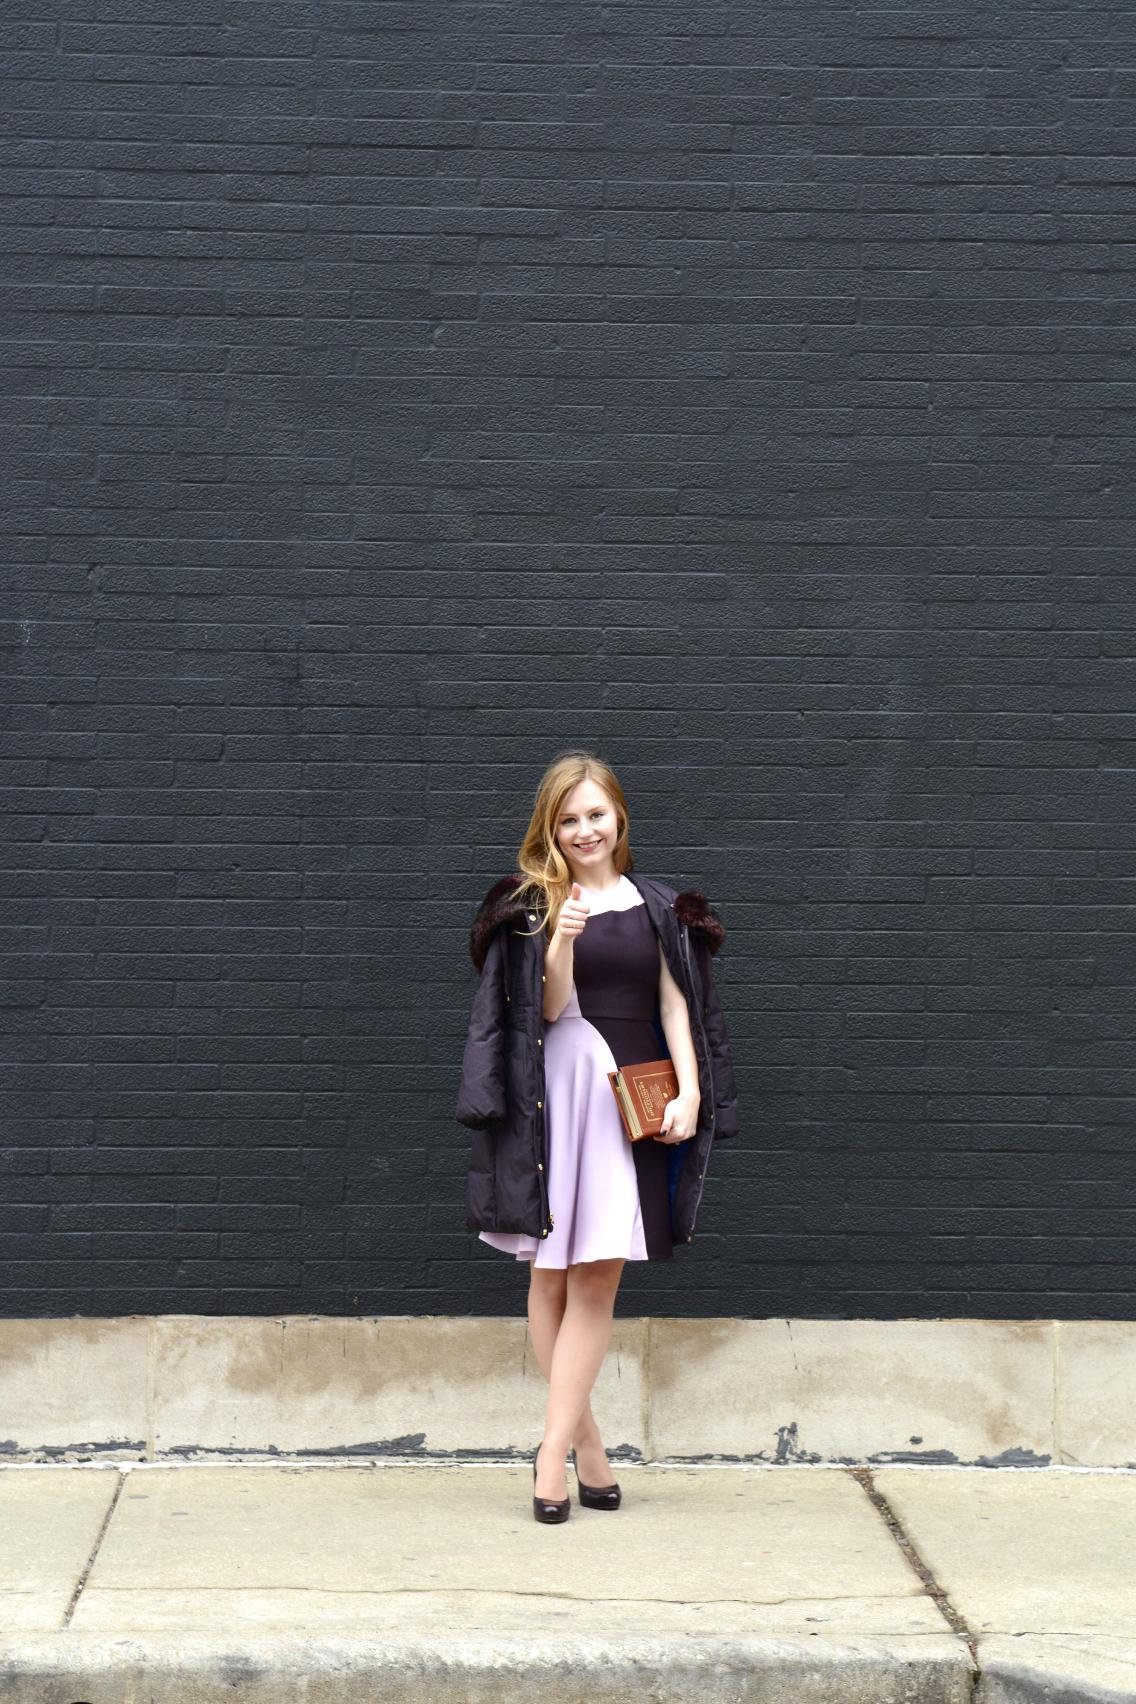 3.1 Phillip Lim Colorblock Dress Kate Spade Dictionary Clutch